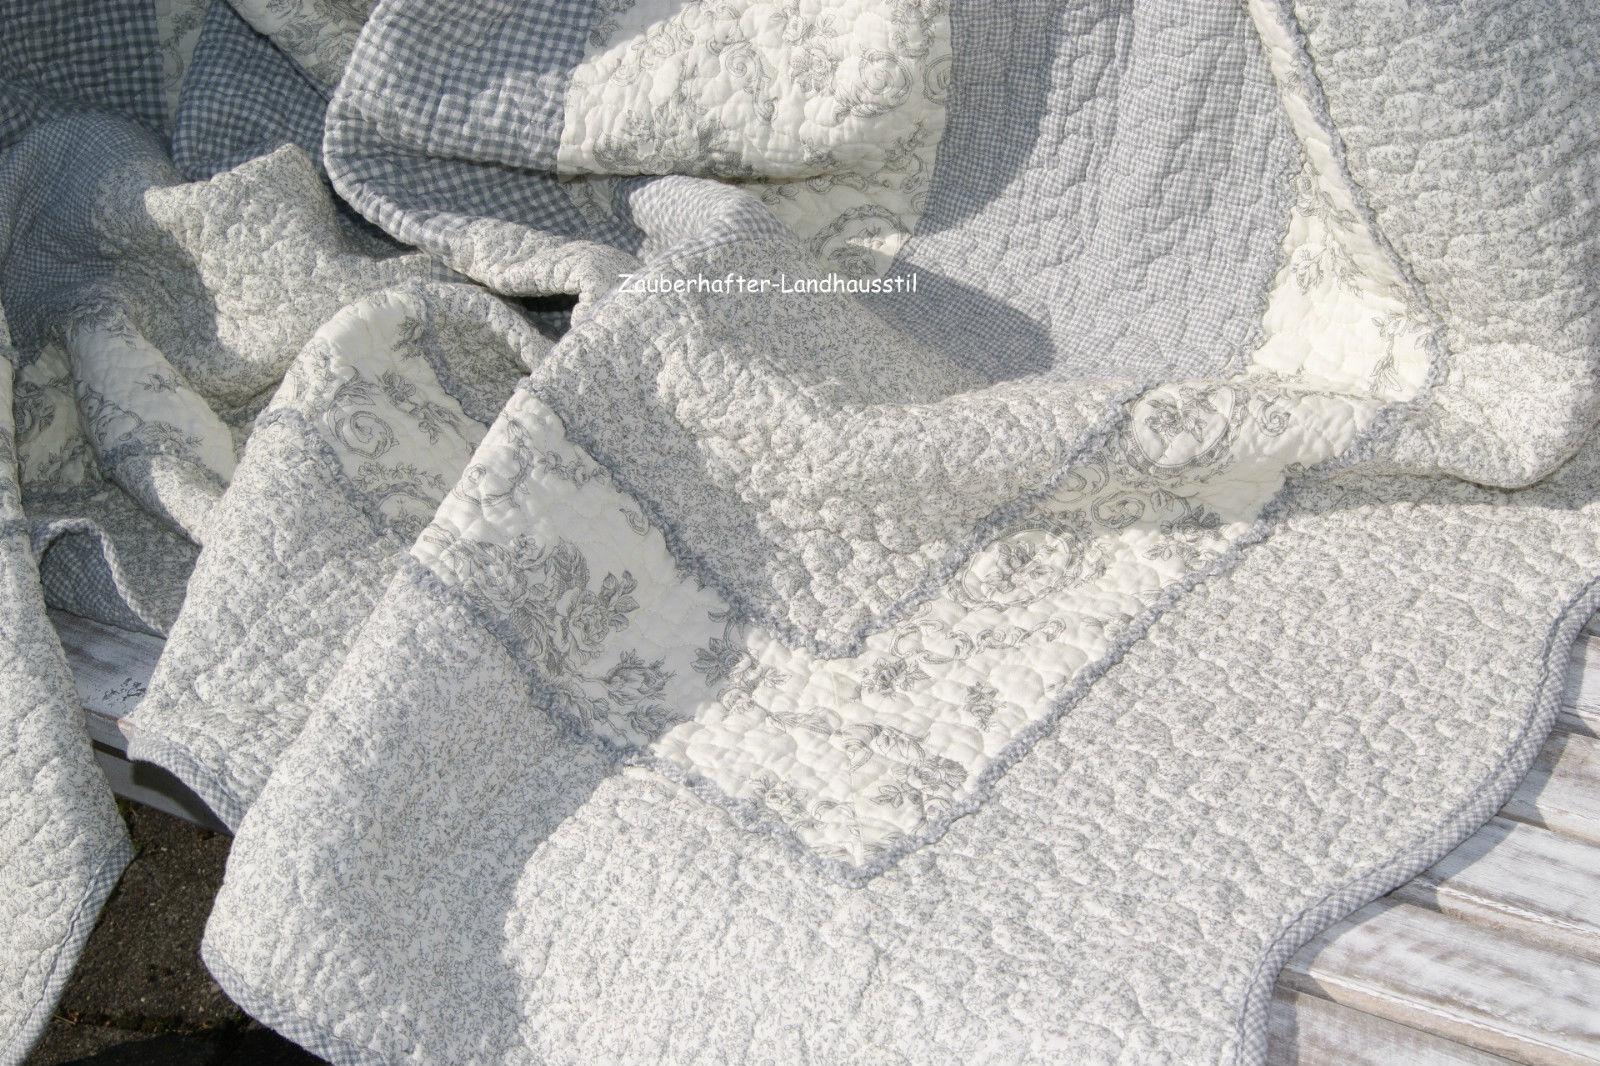 tagesdecke jane 180x260 cm grau creme plaid toile tagesdecken sofa berw rfe decken. Black Bedroom Furniture Sets. Home Design Ideas